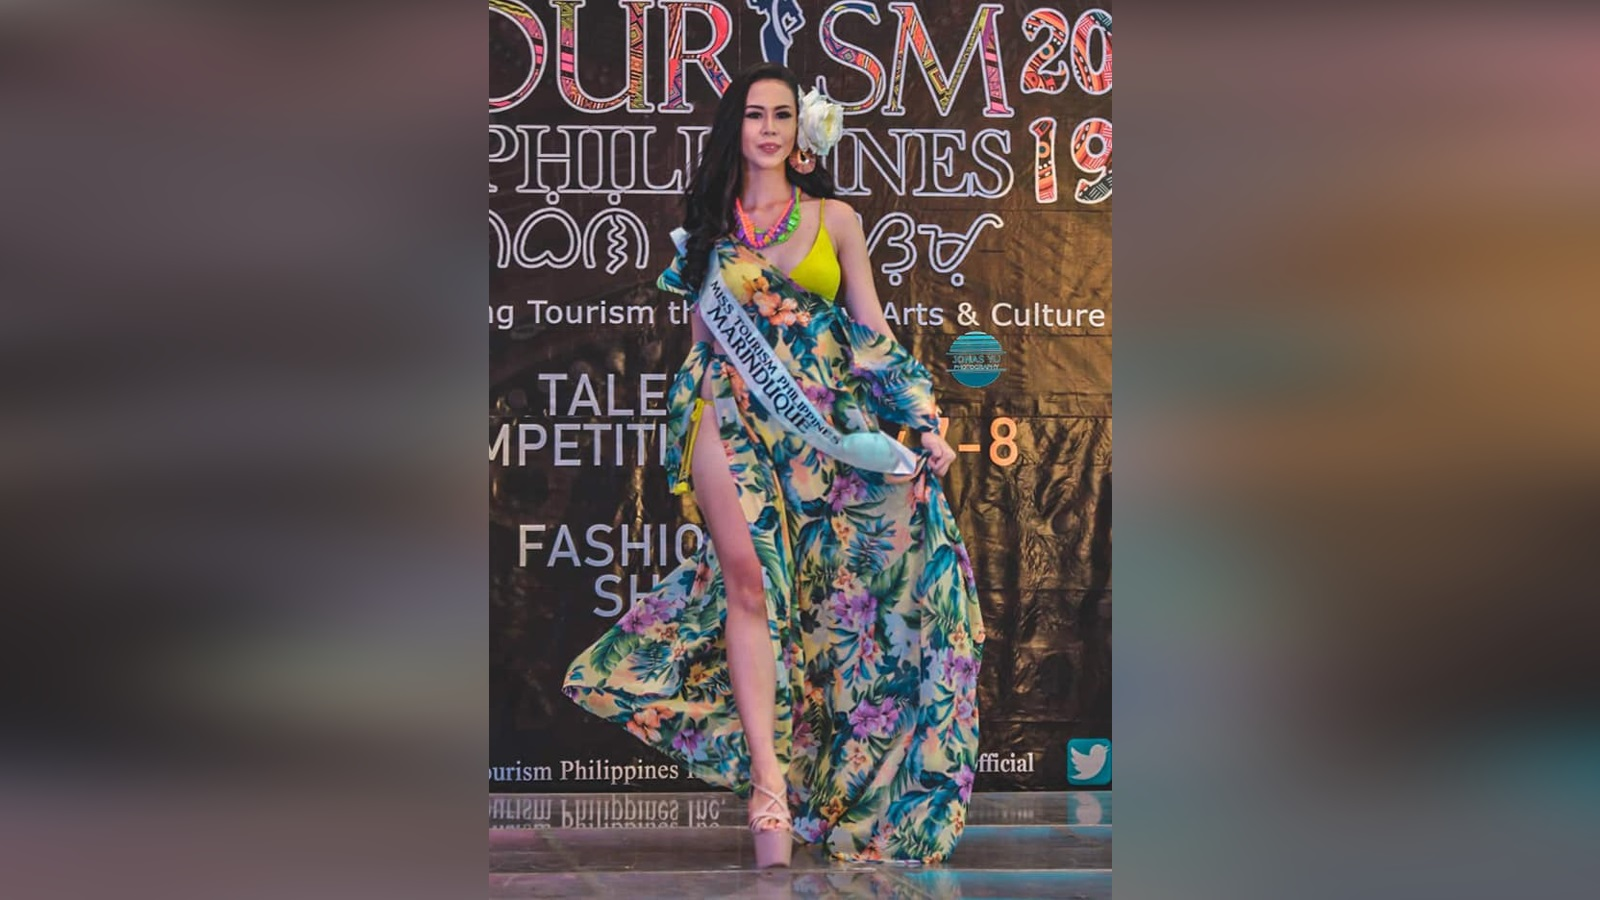 Ms. Tourism PH Marinduque 2019 Princess Nicca Blackburn during the Resort Wear Presentation at SM Fairview, Quezon City